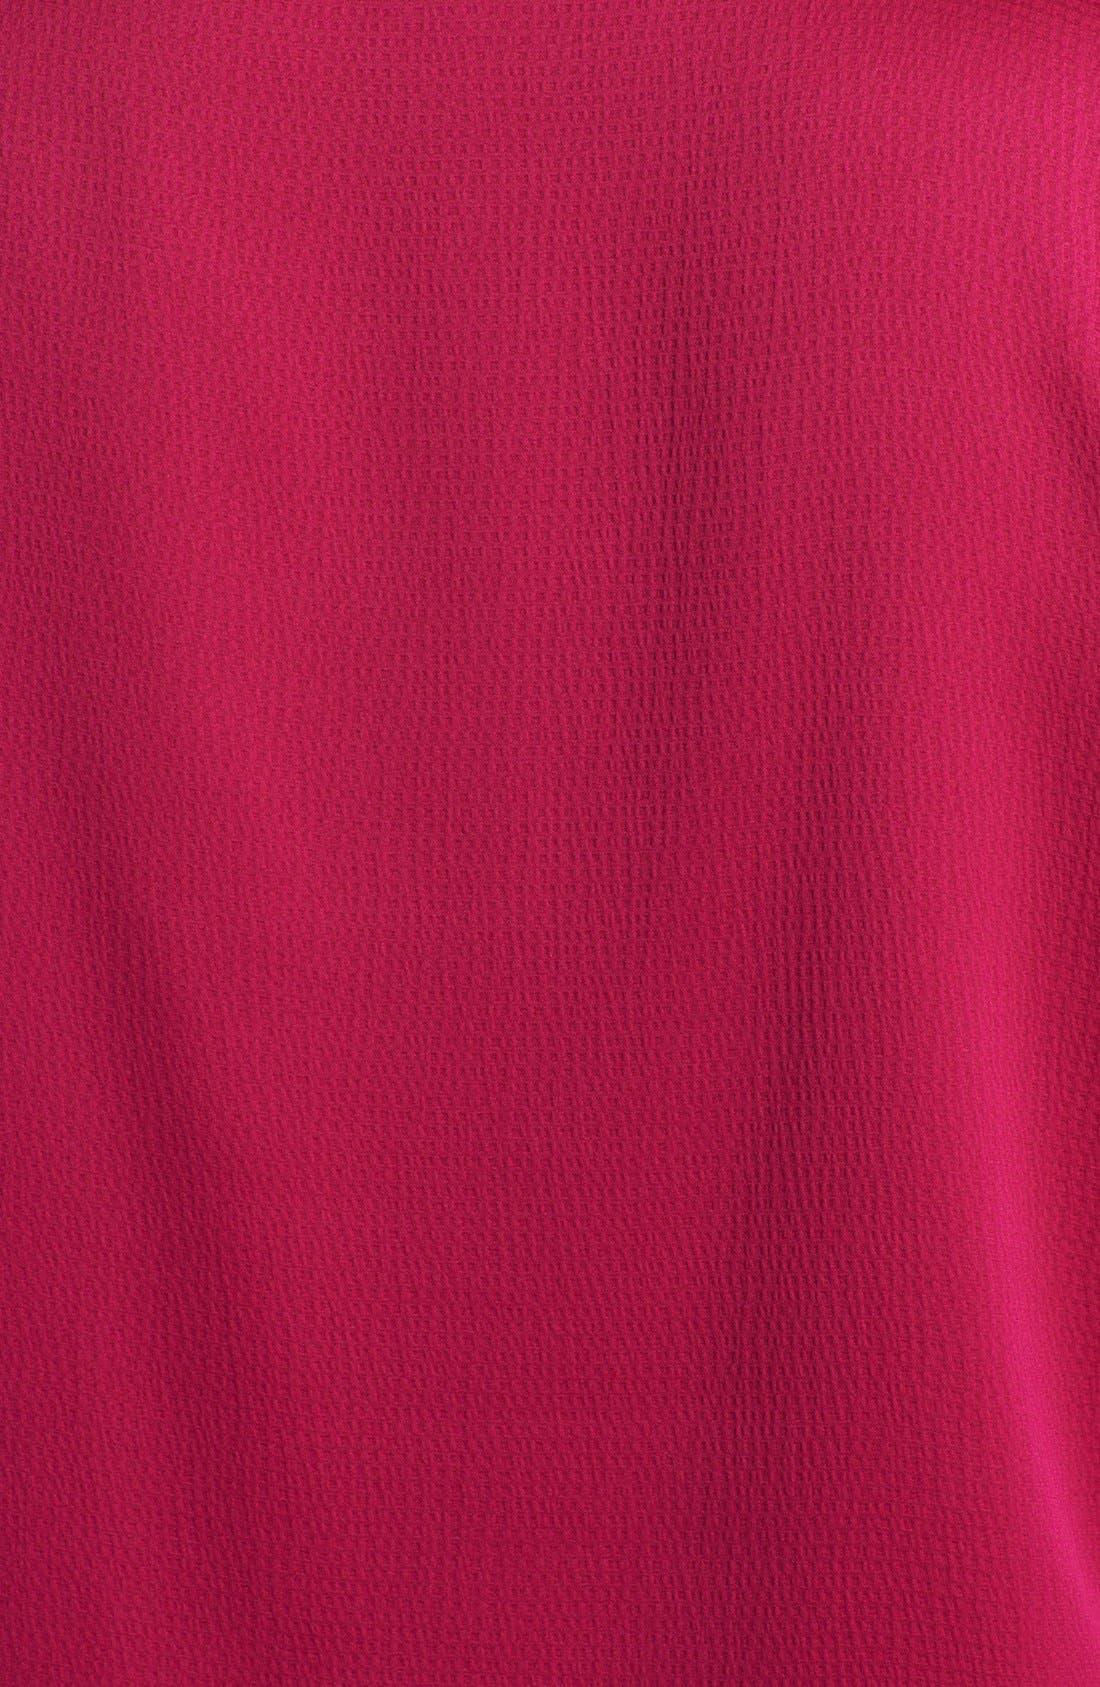 Alternate Image 3  - Anne Klein Textured Satin Blouse (Plus Size)